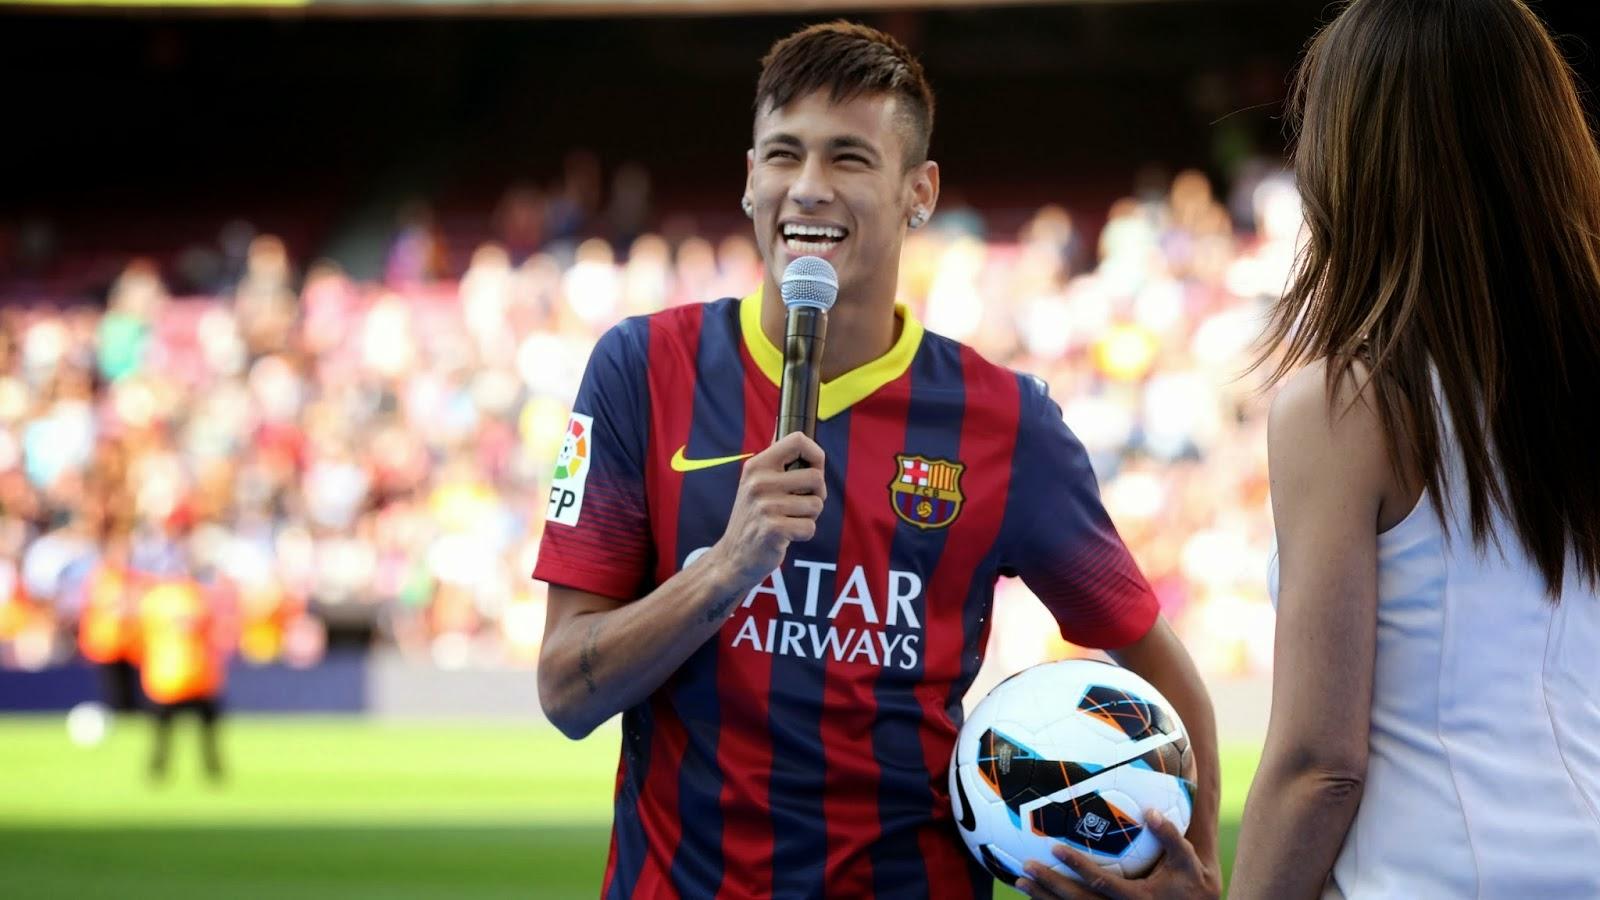 Hd wallpaper neymar - All Sports Players Neymar Jr Hd Wallpapers 2014